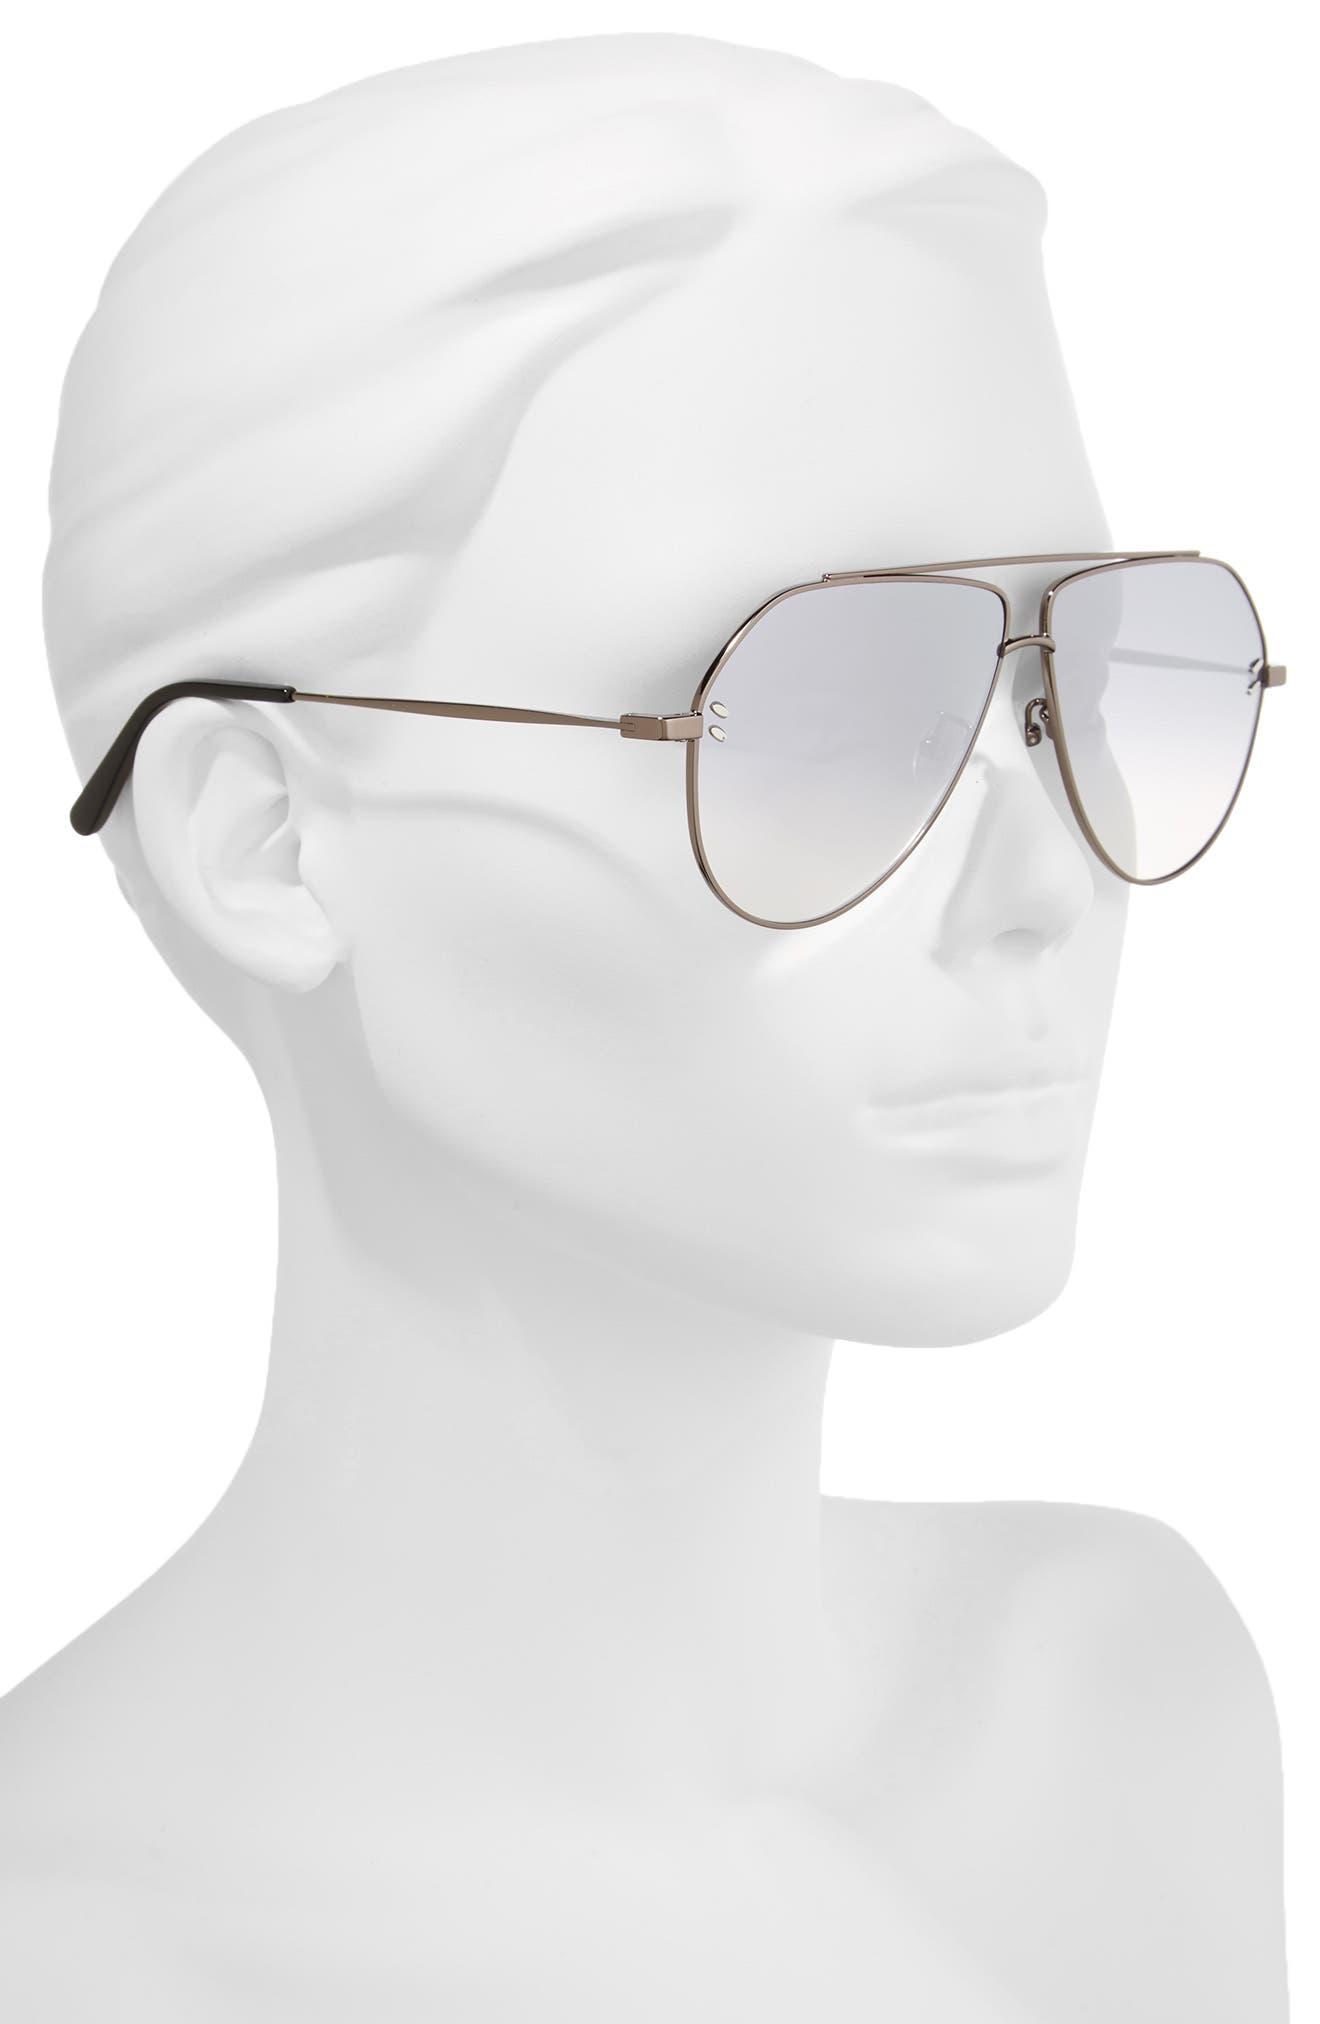 60mm Aviator Sunglasses,                             Alternate thumbnail 2, color,                             040